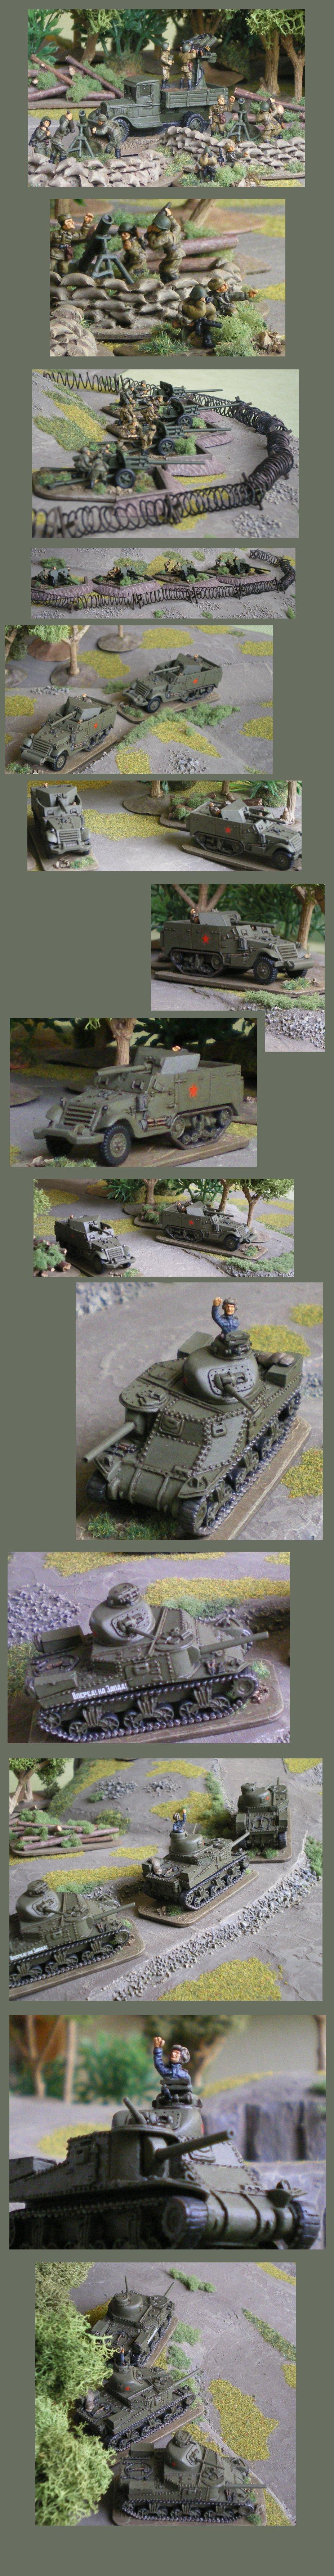 La Grande Guerre Patriotique, Acte II: la crise (15mm) 160120010530533391